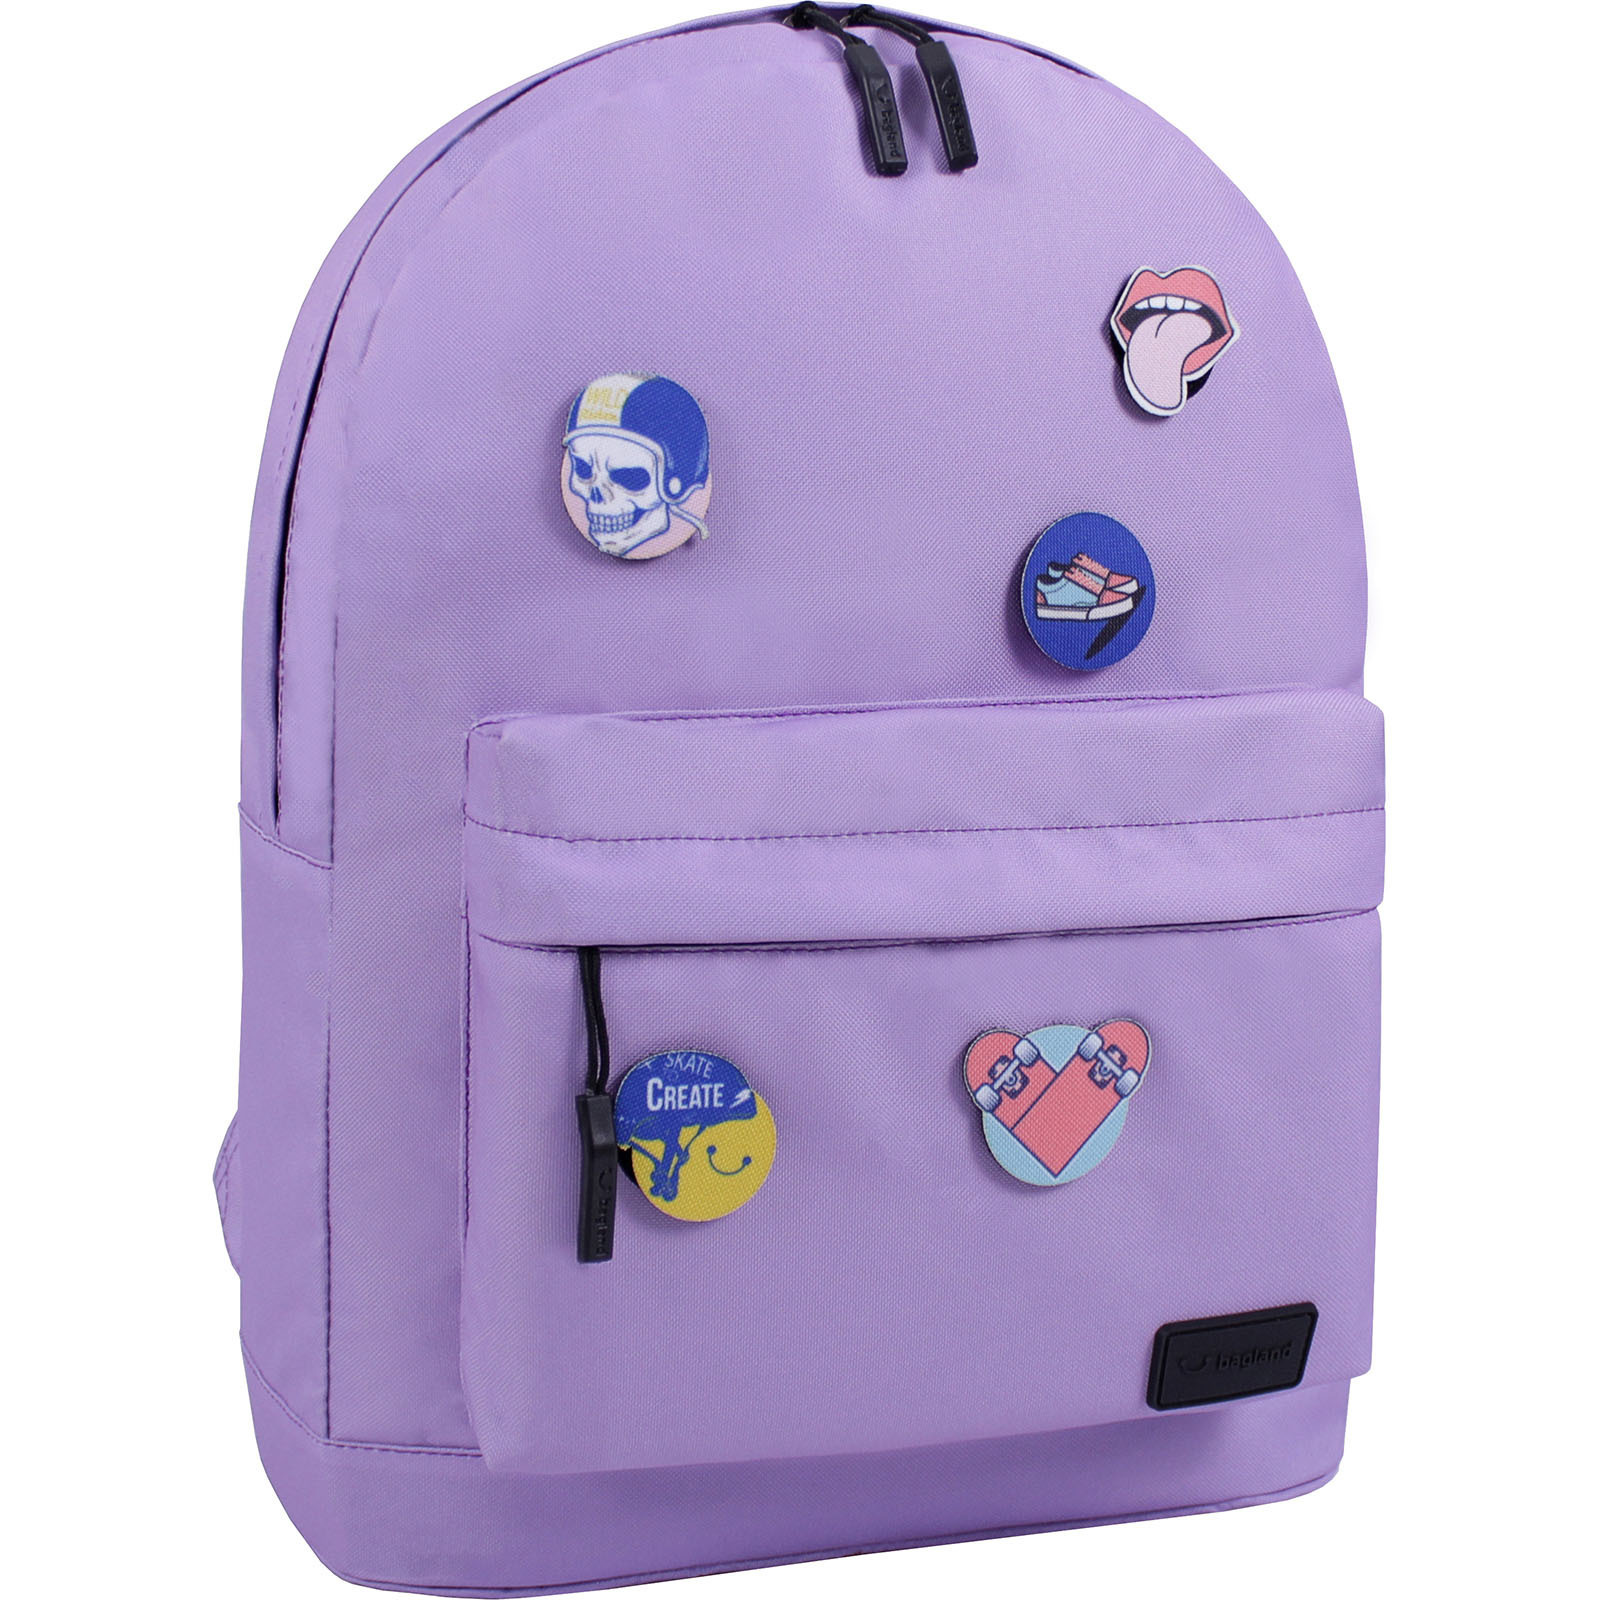 Молодежные рюкзаки Рюкзак Bagland Молодежный W/R 17 л. Сиреневый (00533664 Ш) IMG_1343.JPG